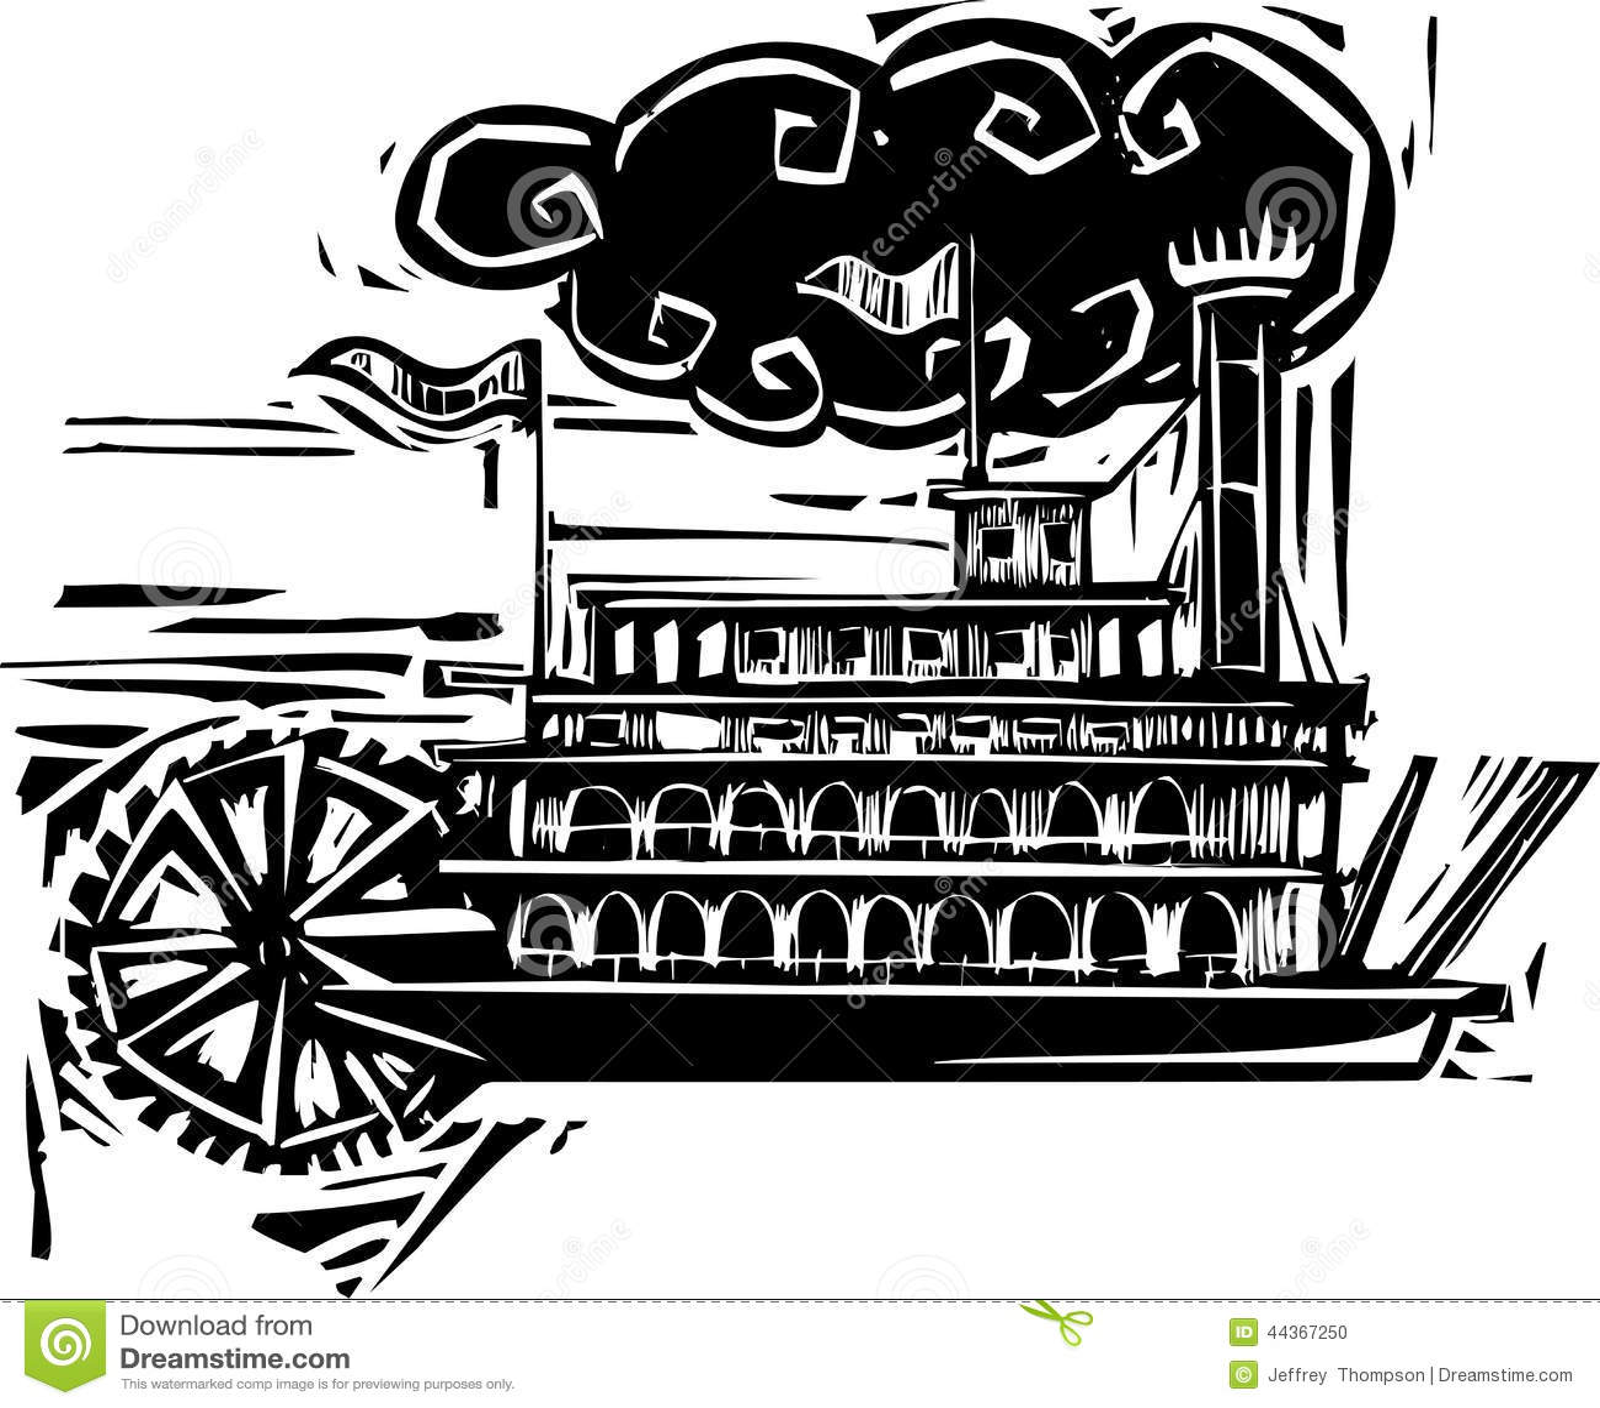 Woodcut Stern Wheel Riverboat Stock Vector - Image: 44367250